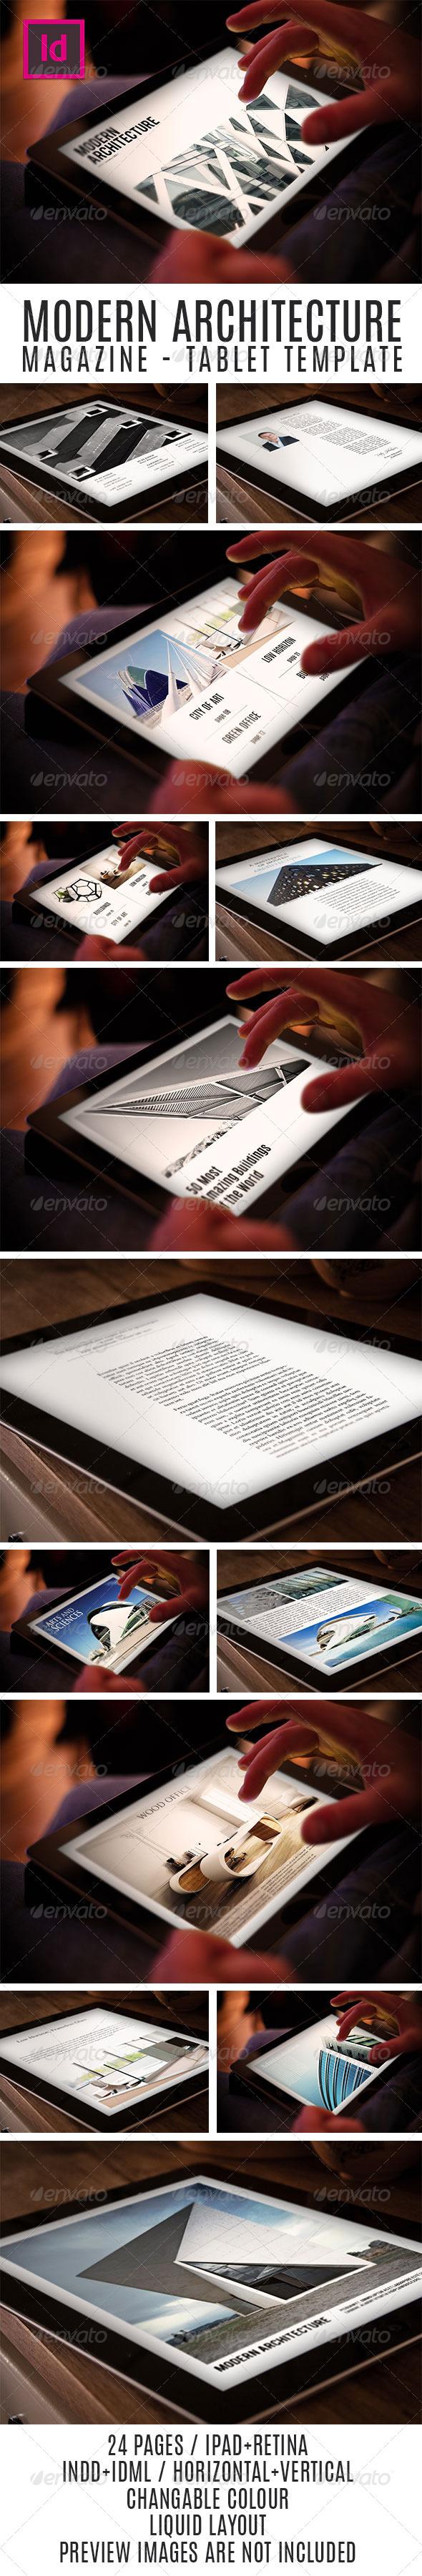 GraphicRiver Tablet Modern Architecture Magazine Template 7806579